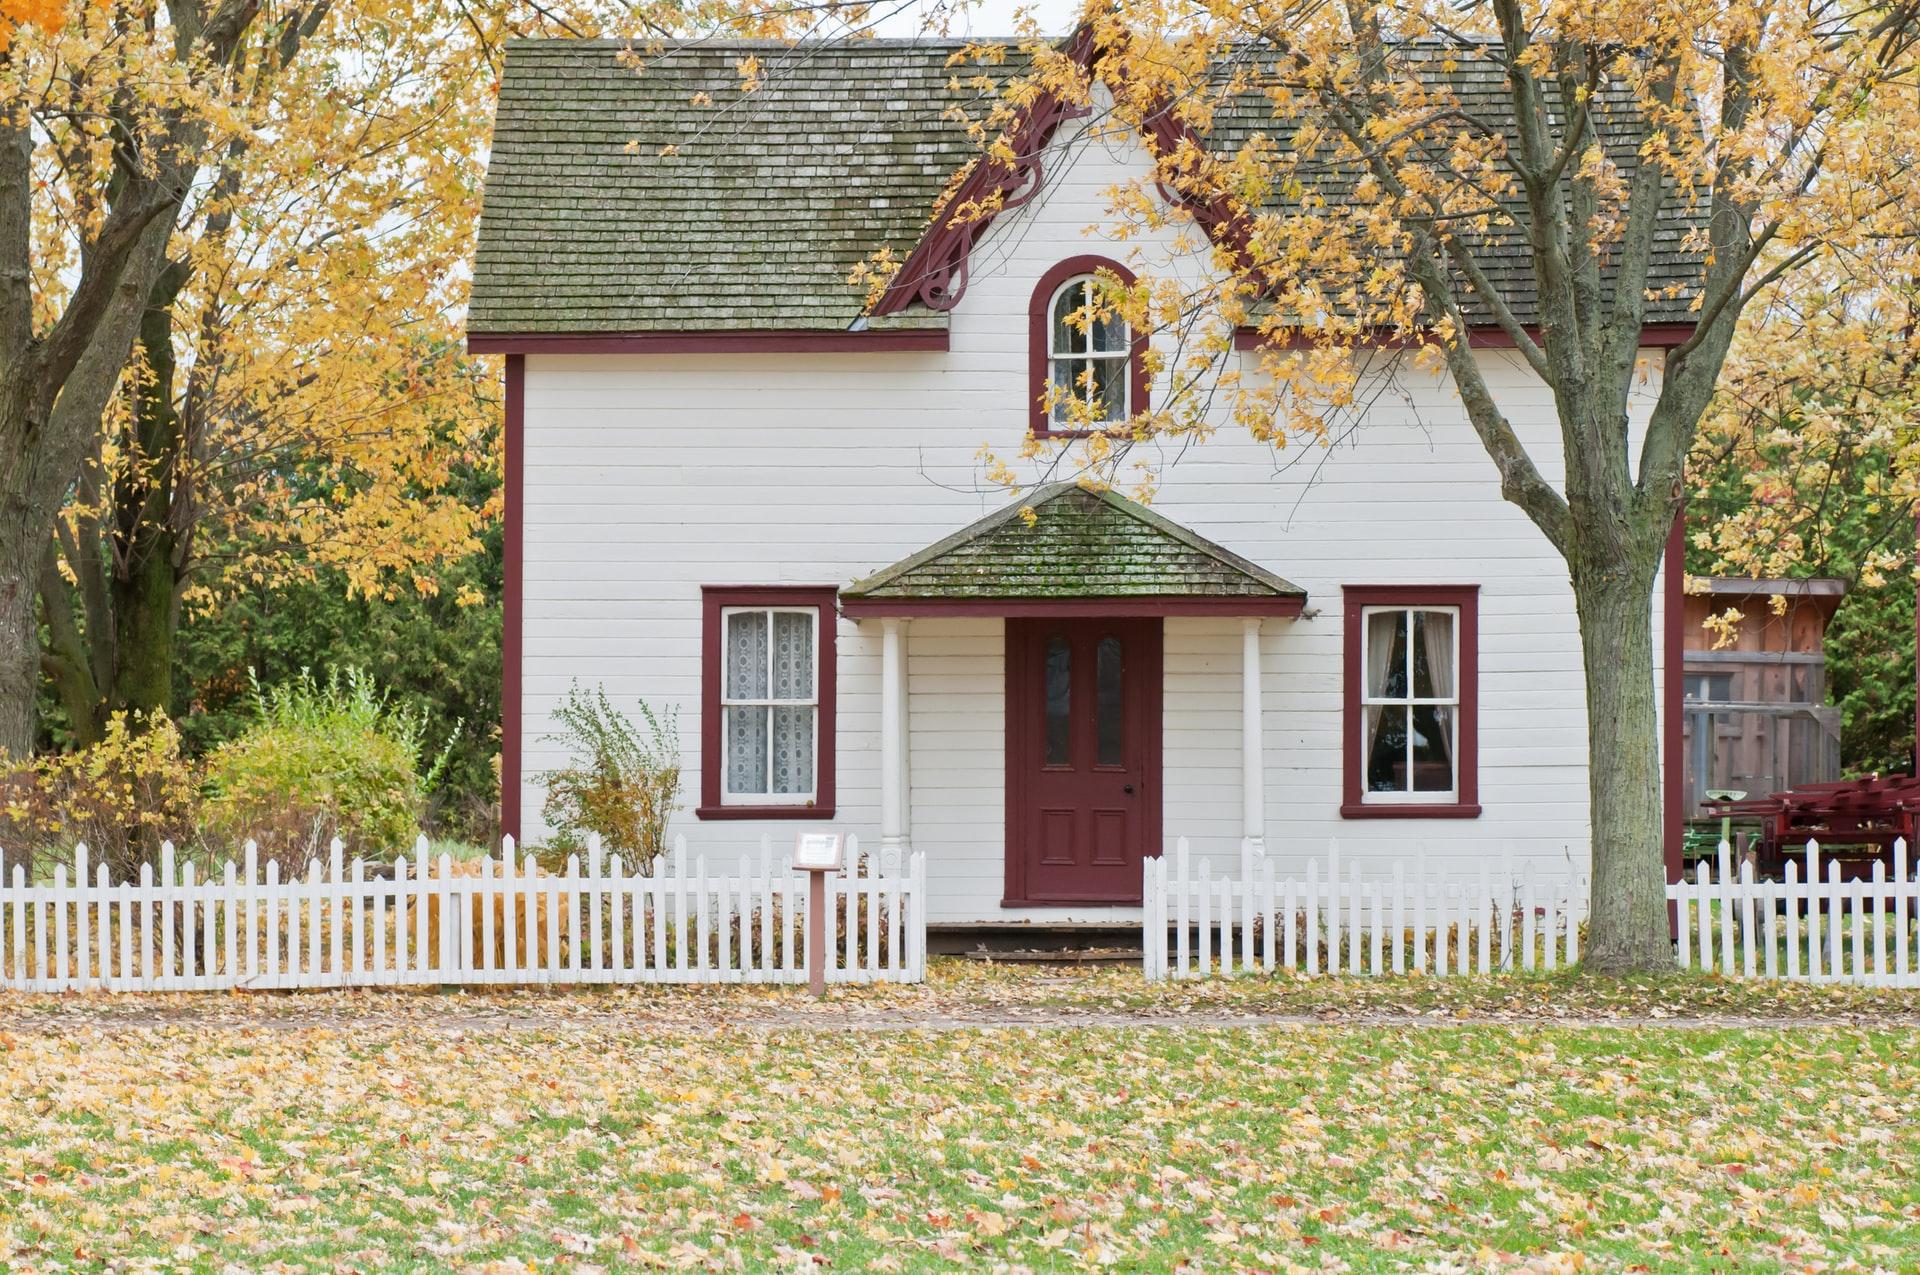 wit rood houten huis